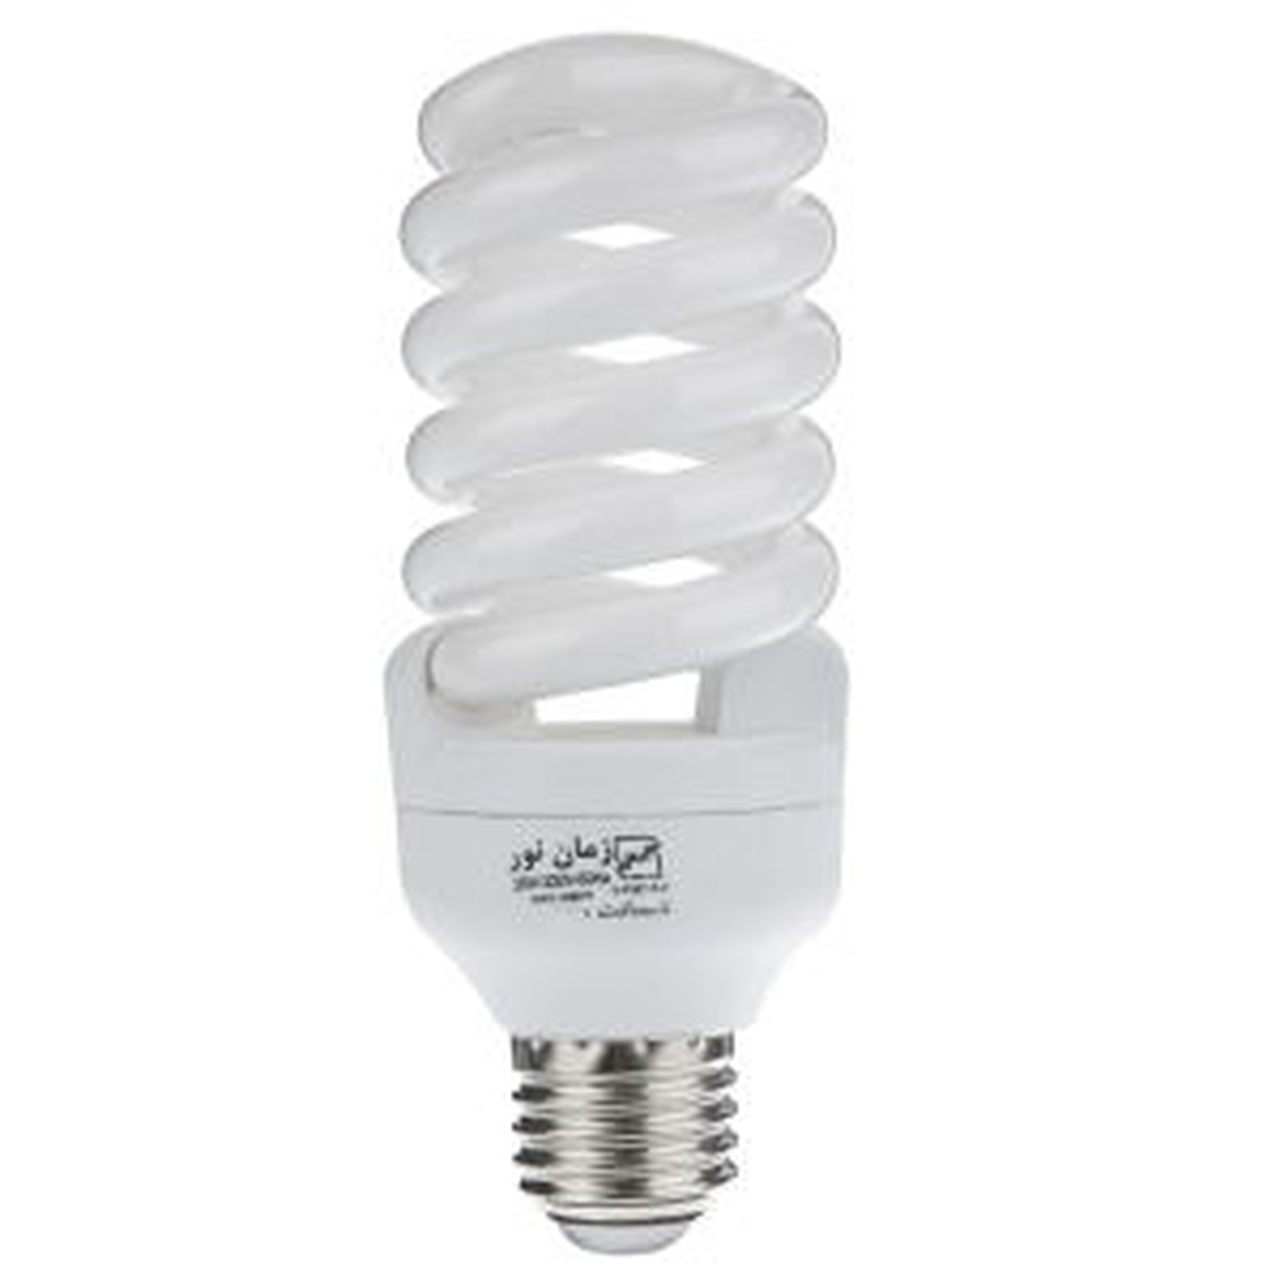 لامپ کم مصرف 26 وات زمان نور مدل Full Spiral پایه E27